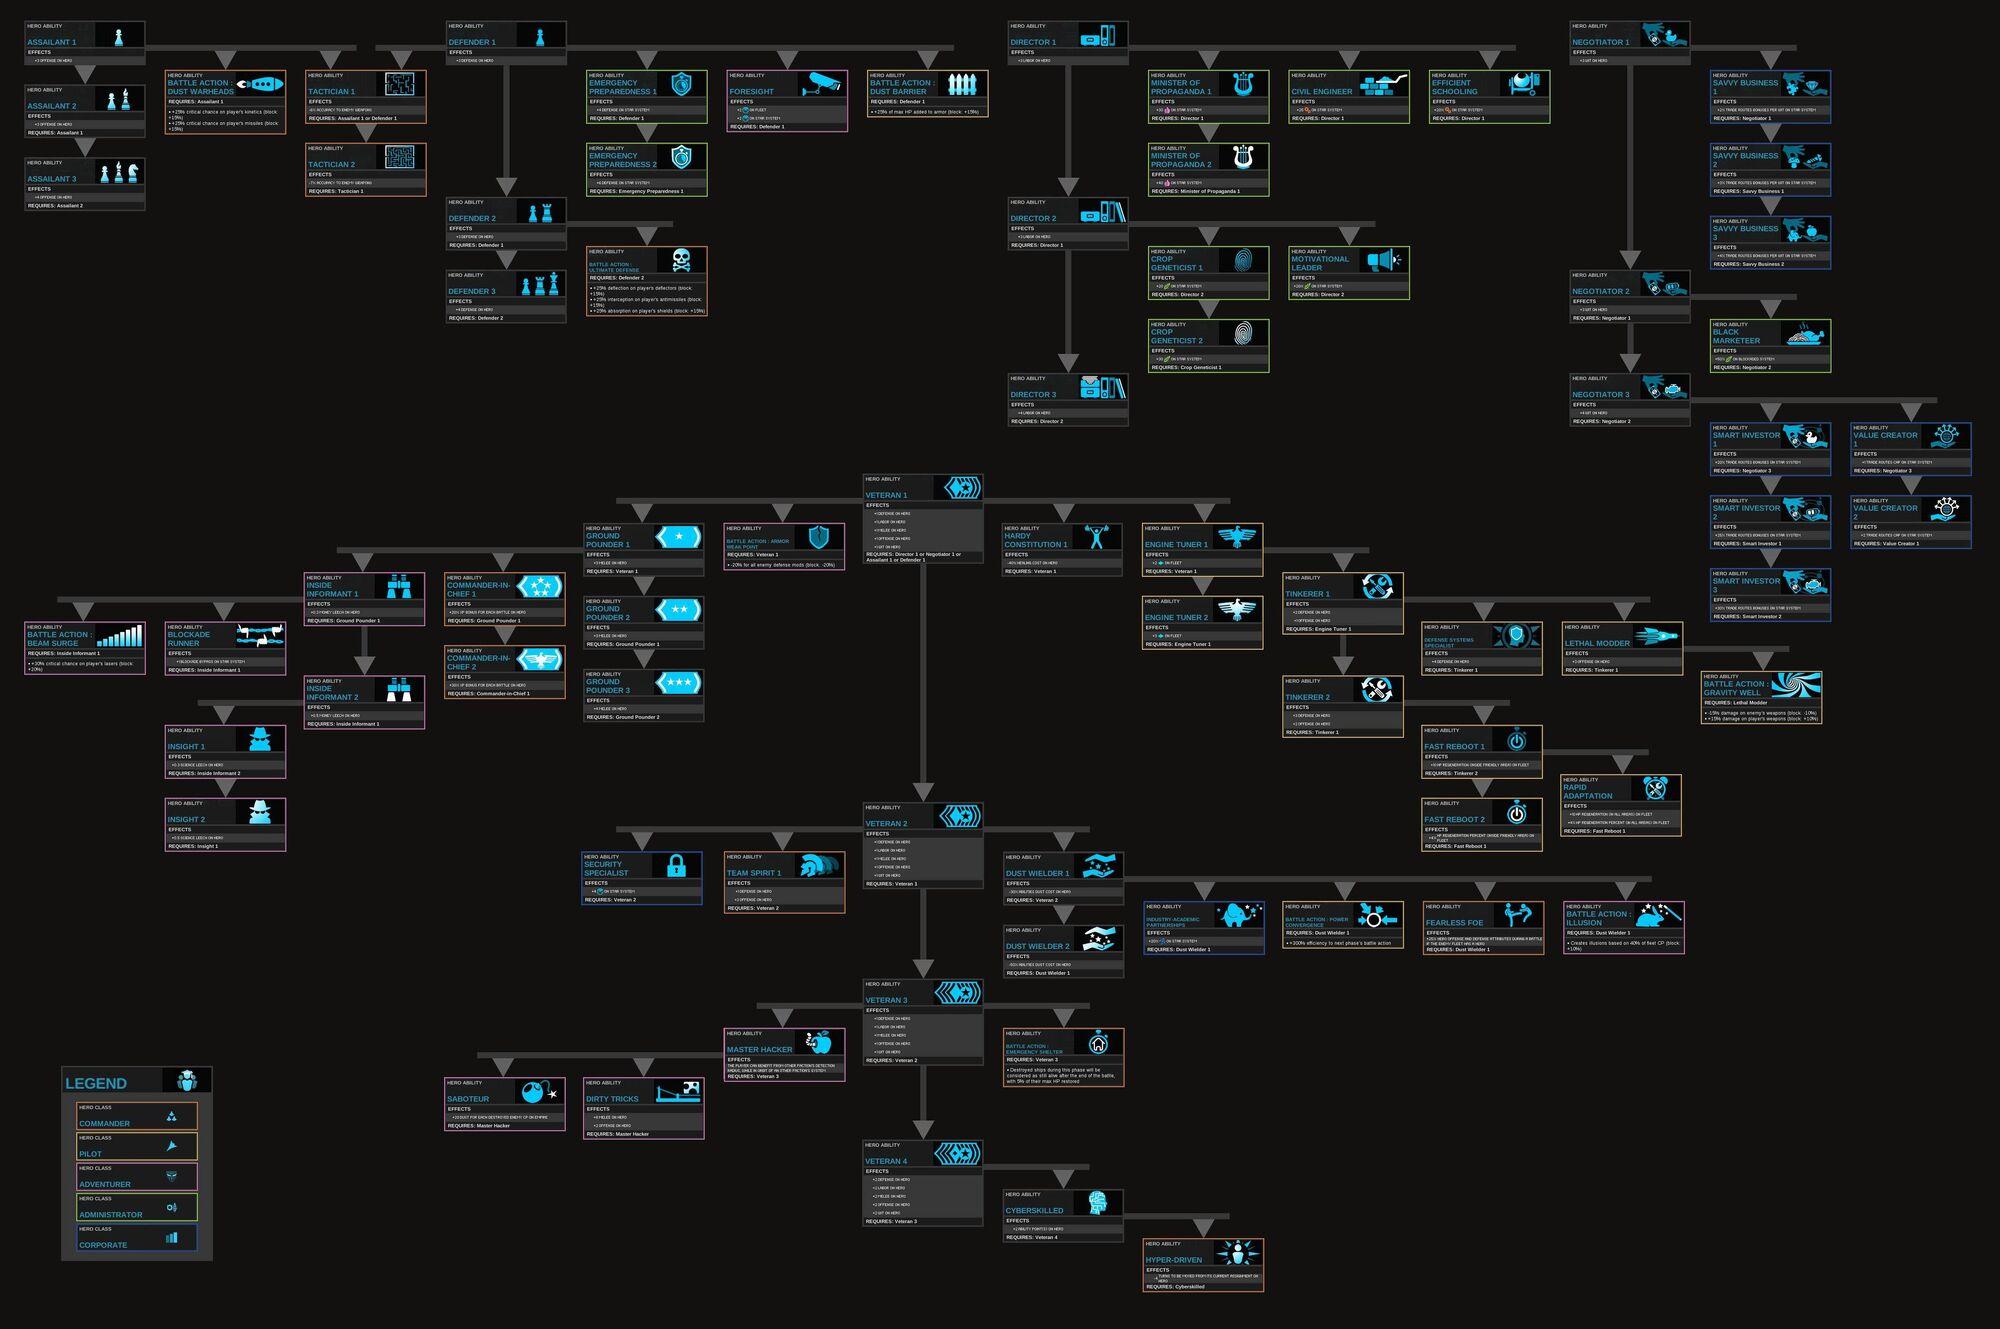 Hero Abilities | Endless Space Wiki | FANDOM powered by Wikia